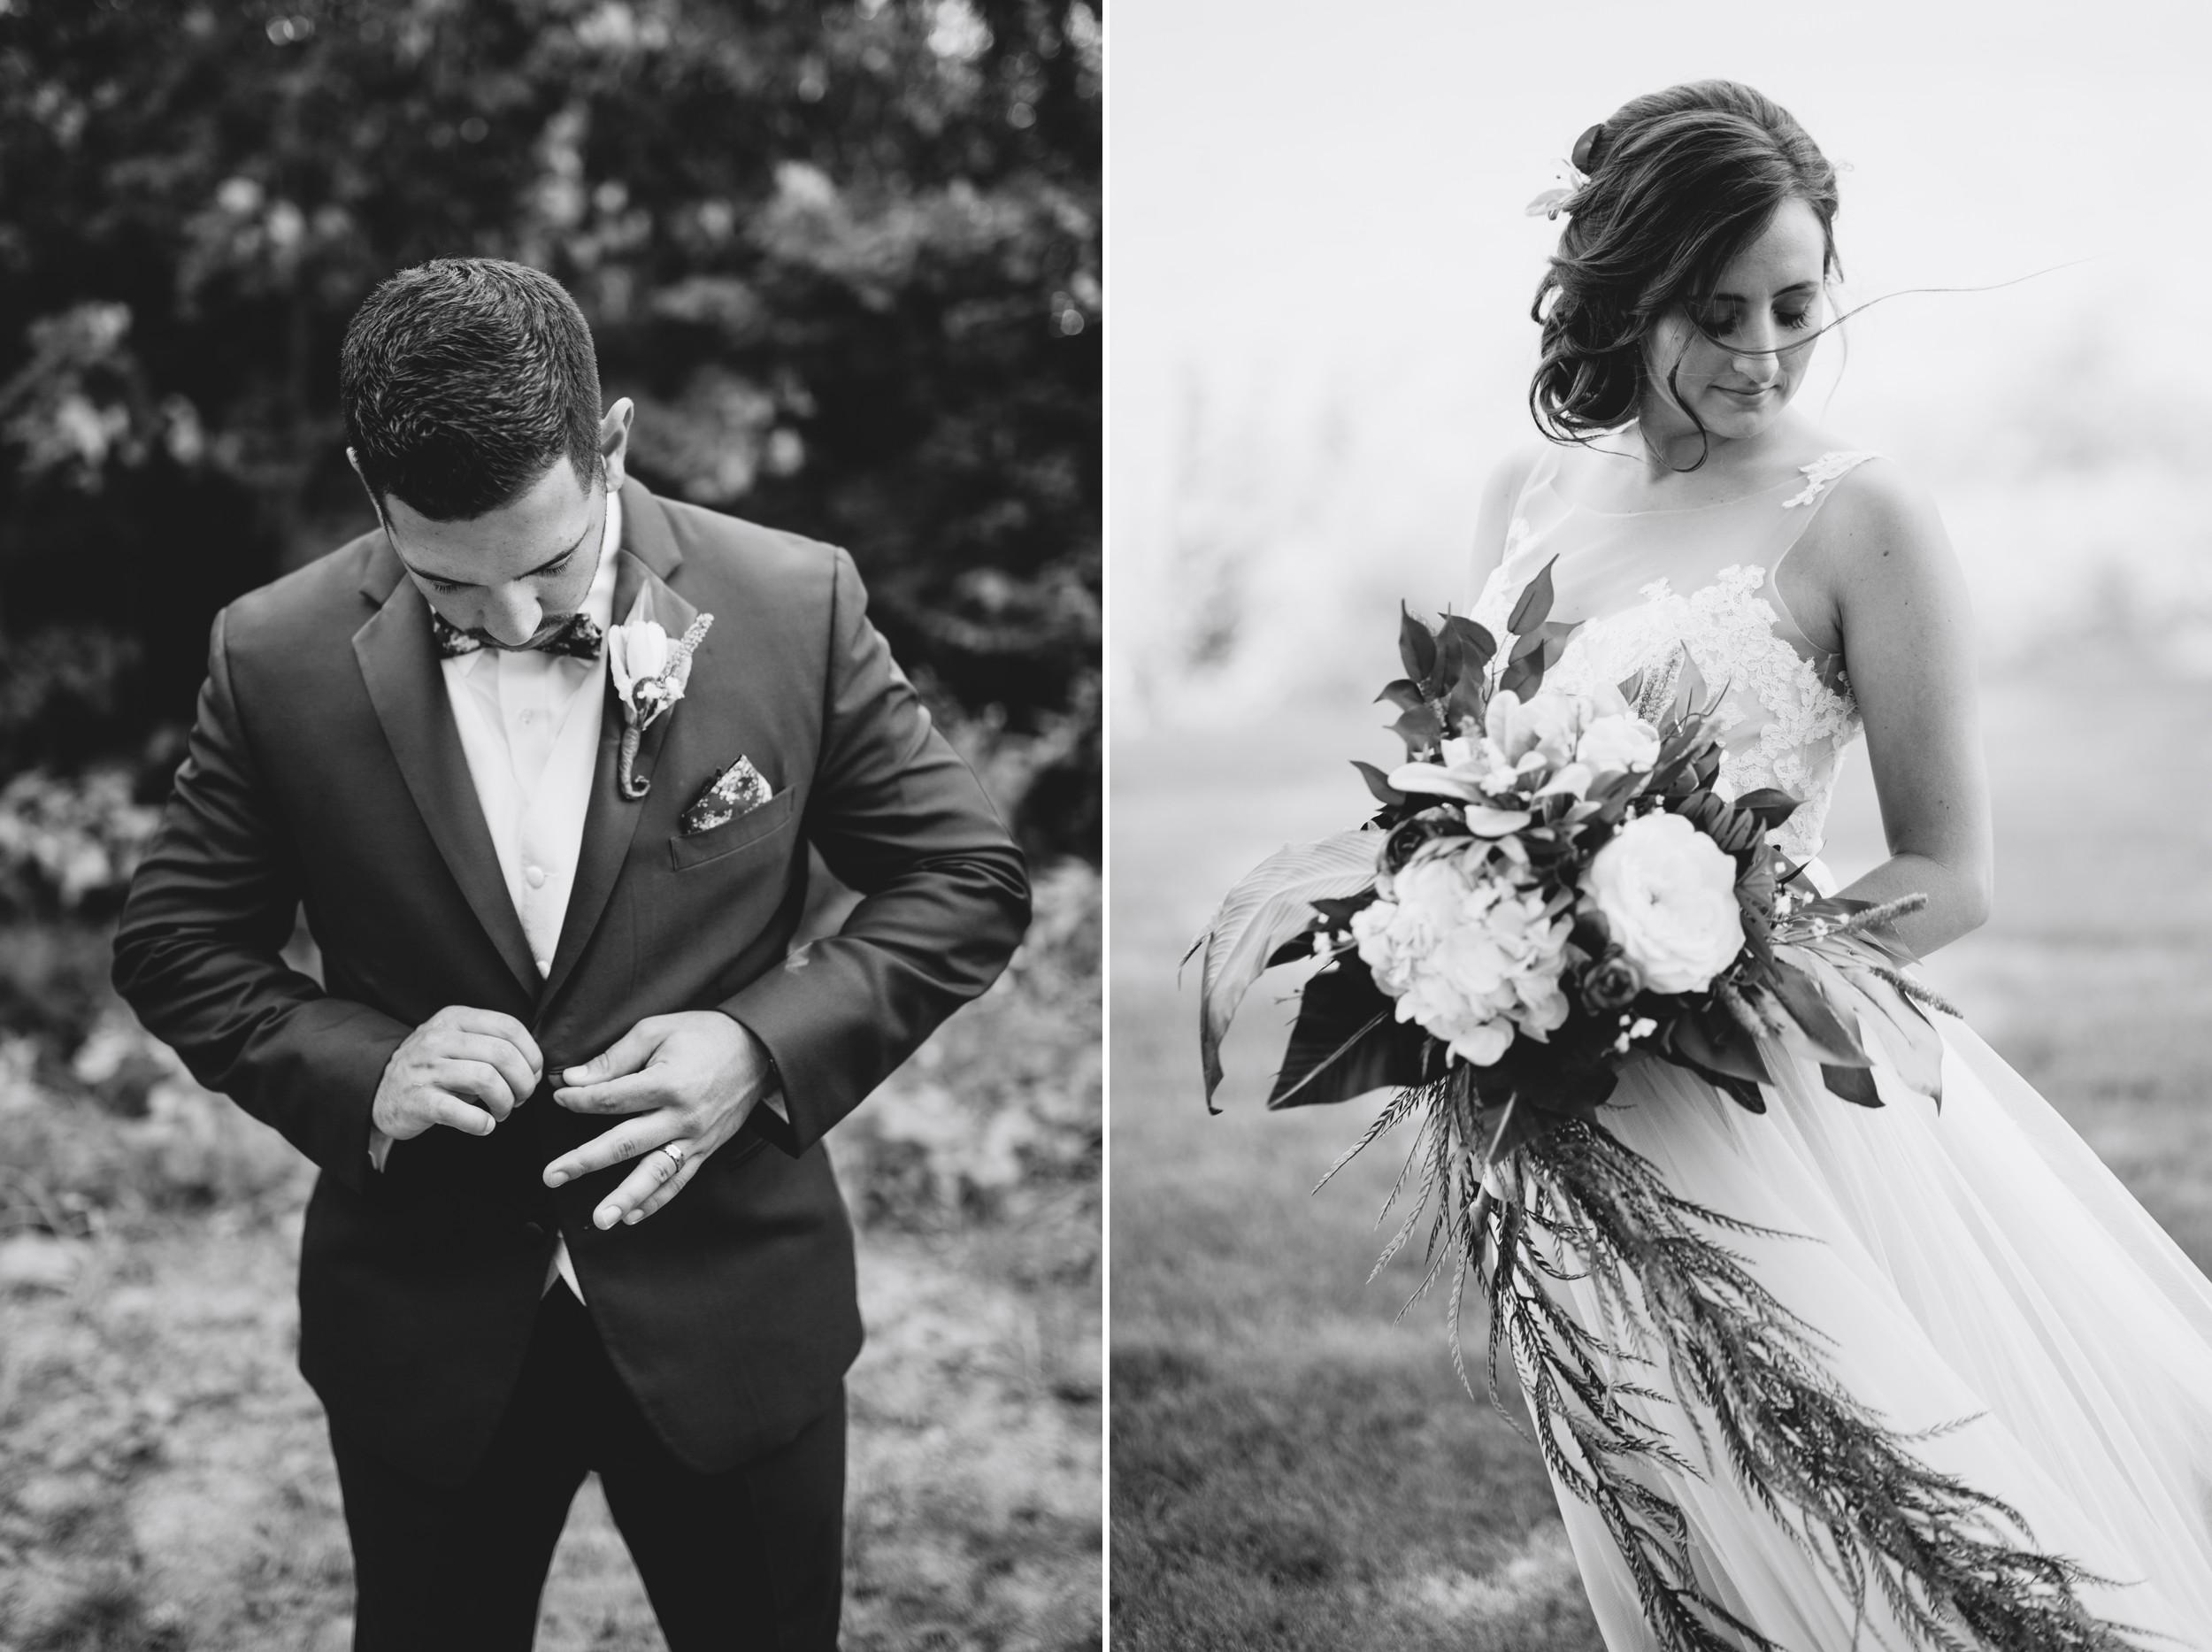 Nick-and-martina-pinelake-vinyards-wedding-columbiana-ohio-tracylynn-photography 29.jpg